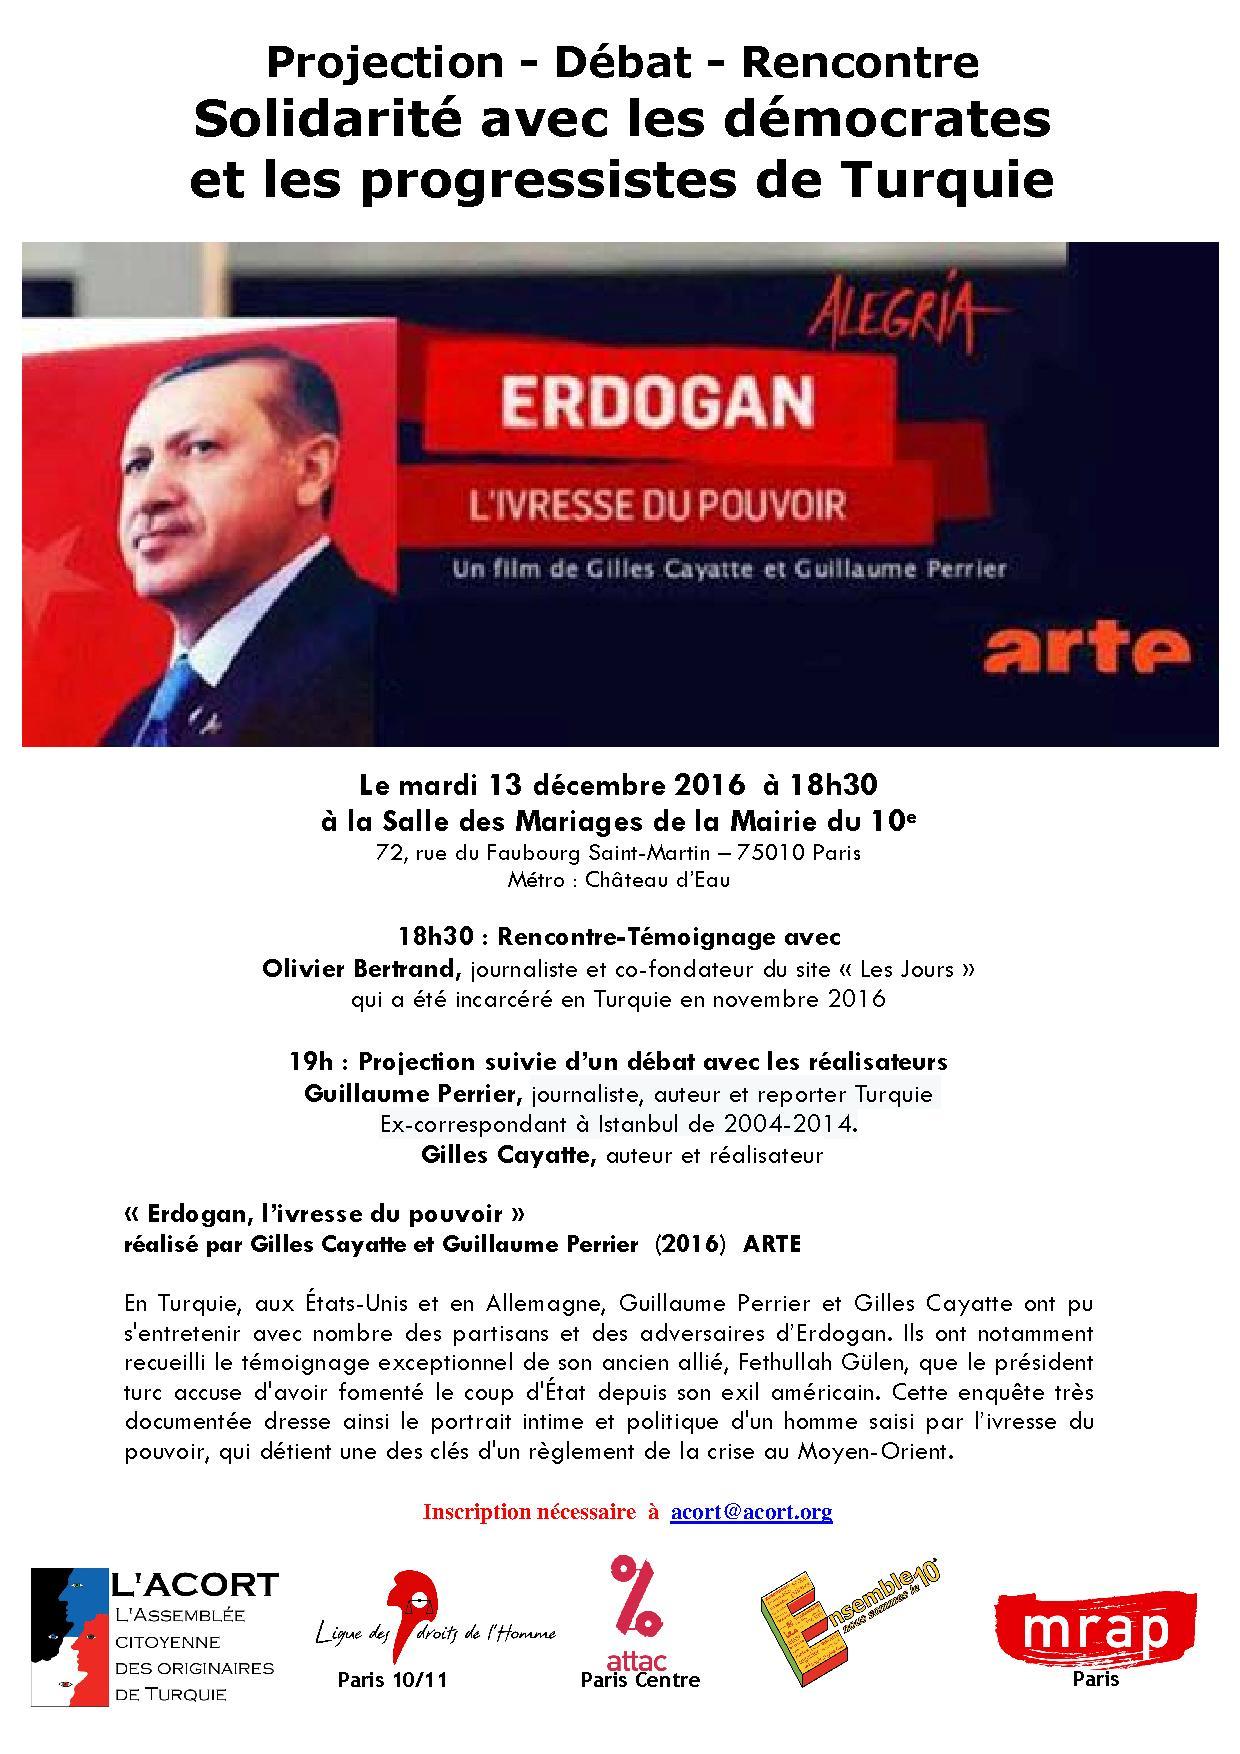 site de rencontres turque